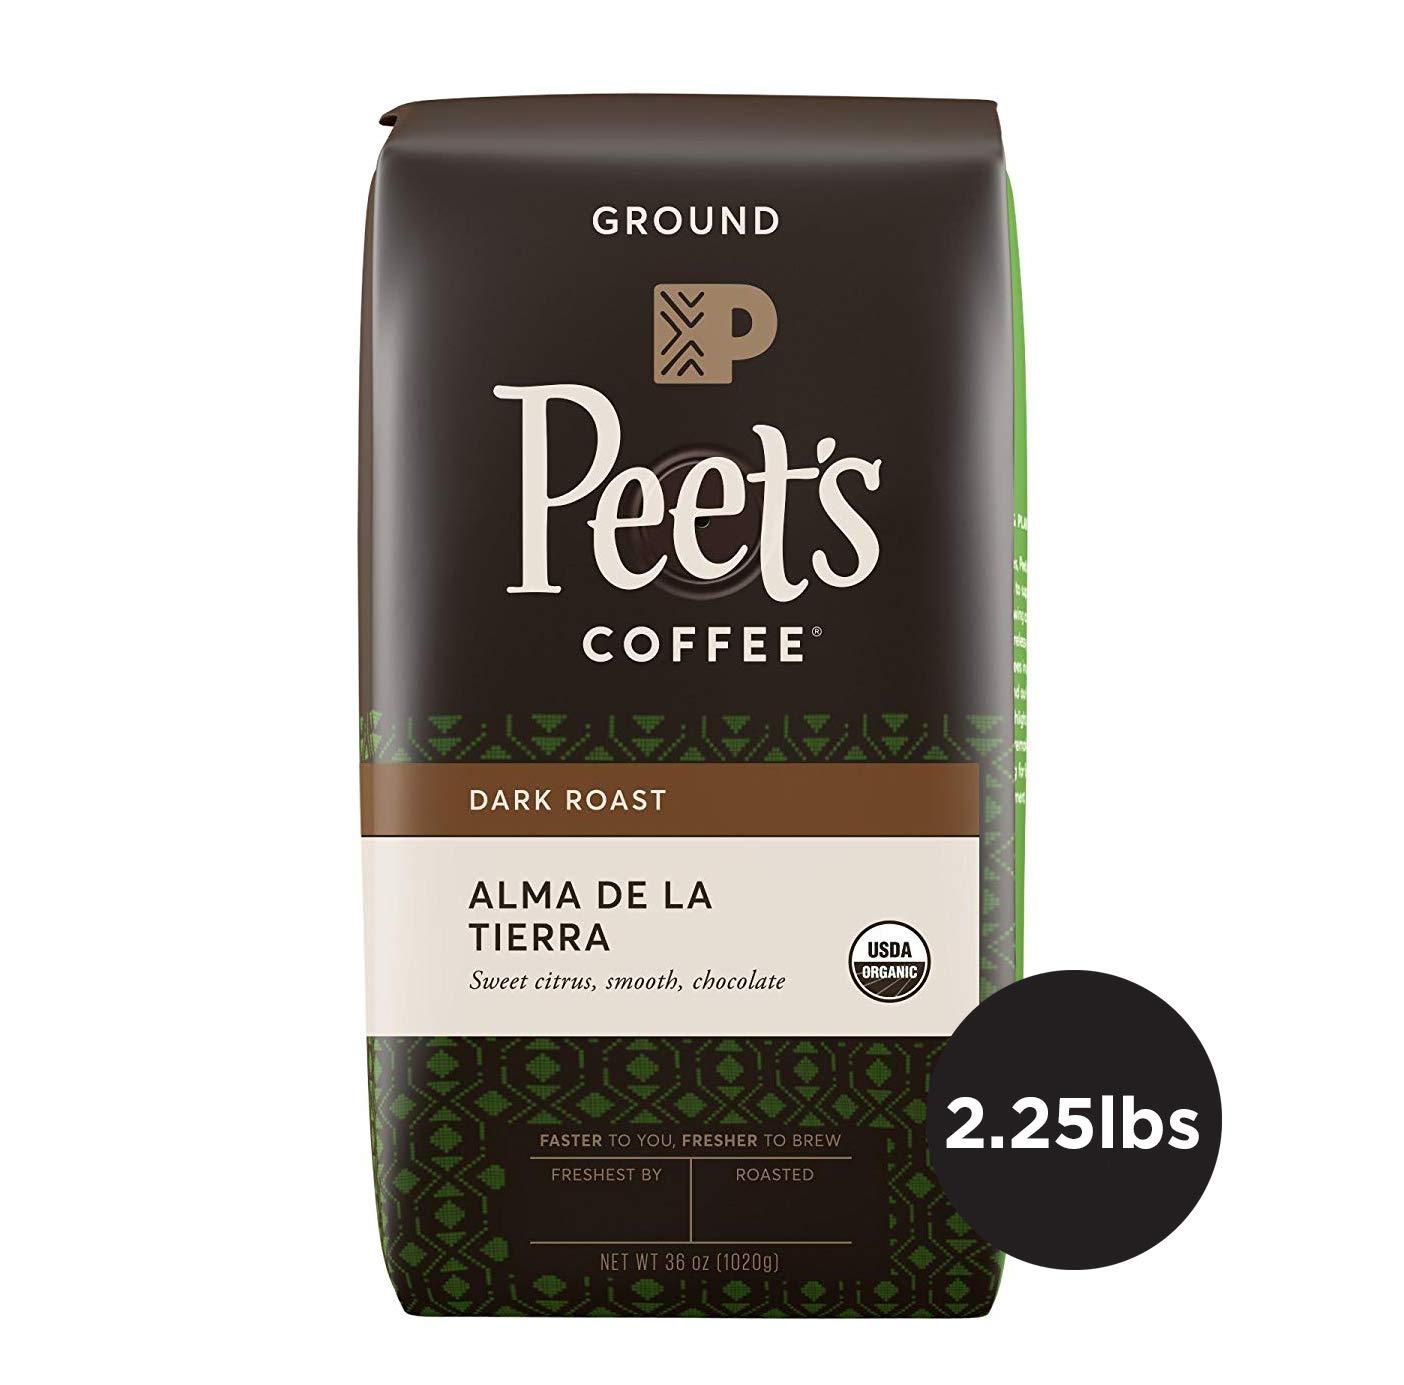 Peet's Coffee Alma de la Tierra Dark Roast Ground Coffee Organic, 2.25 Pound Bag USDA Organic